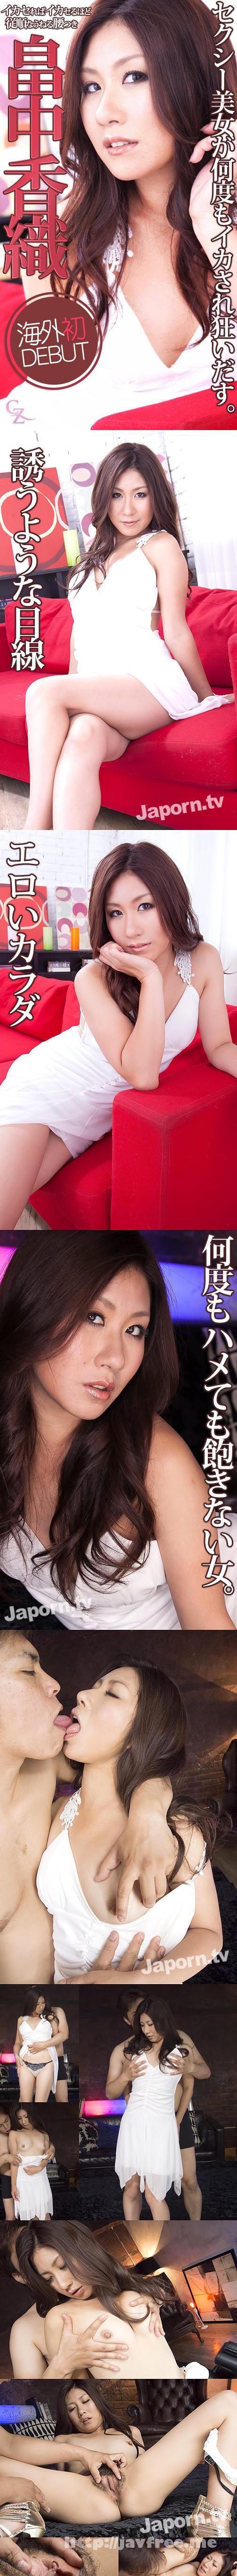 [CZ 003] イカセればイカセるほど従順なうねる腰つき : 畠中香織  畠中香織 Kaori Hatanaka CZ